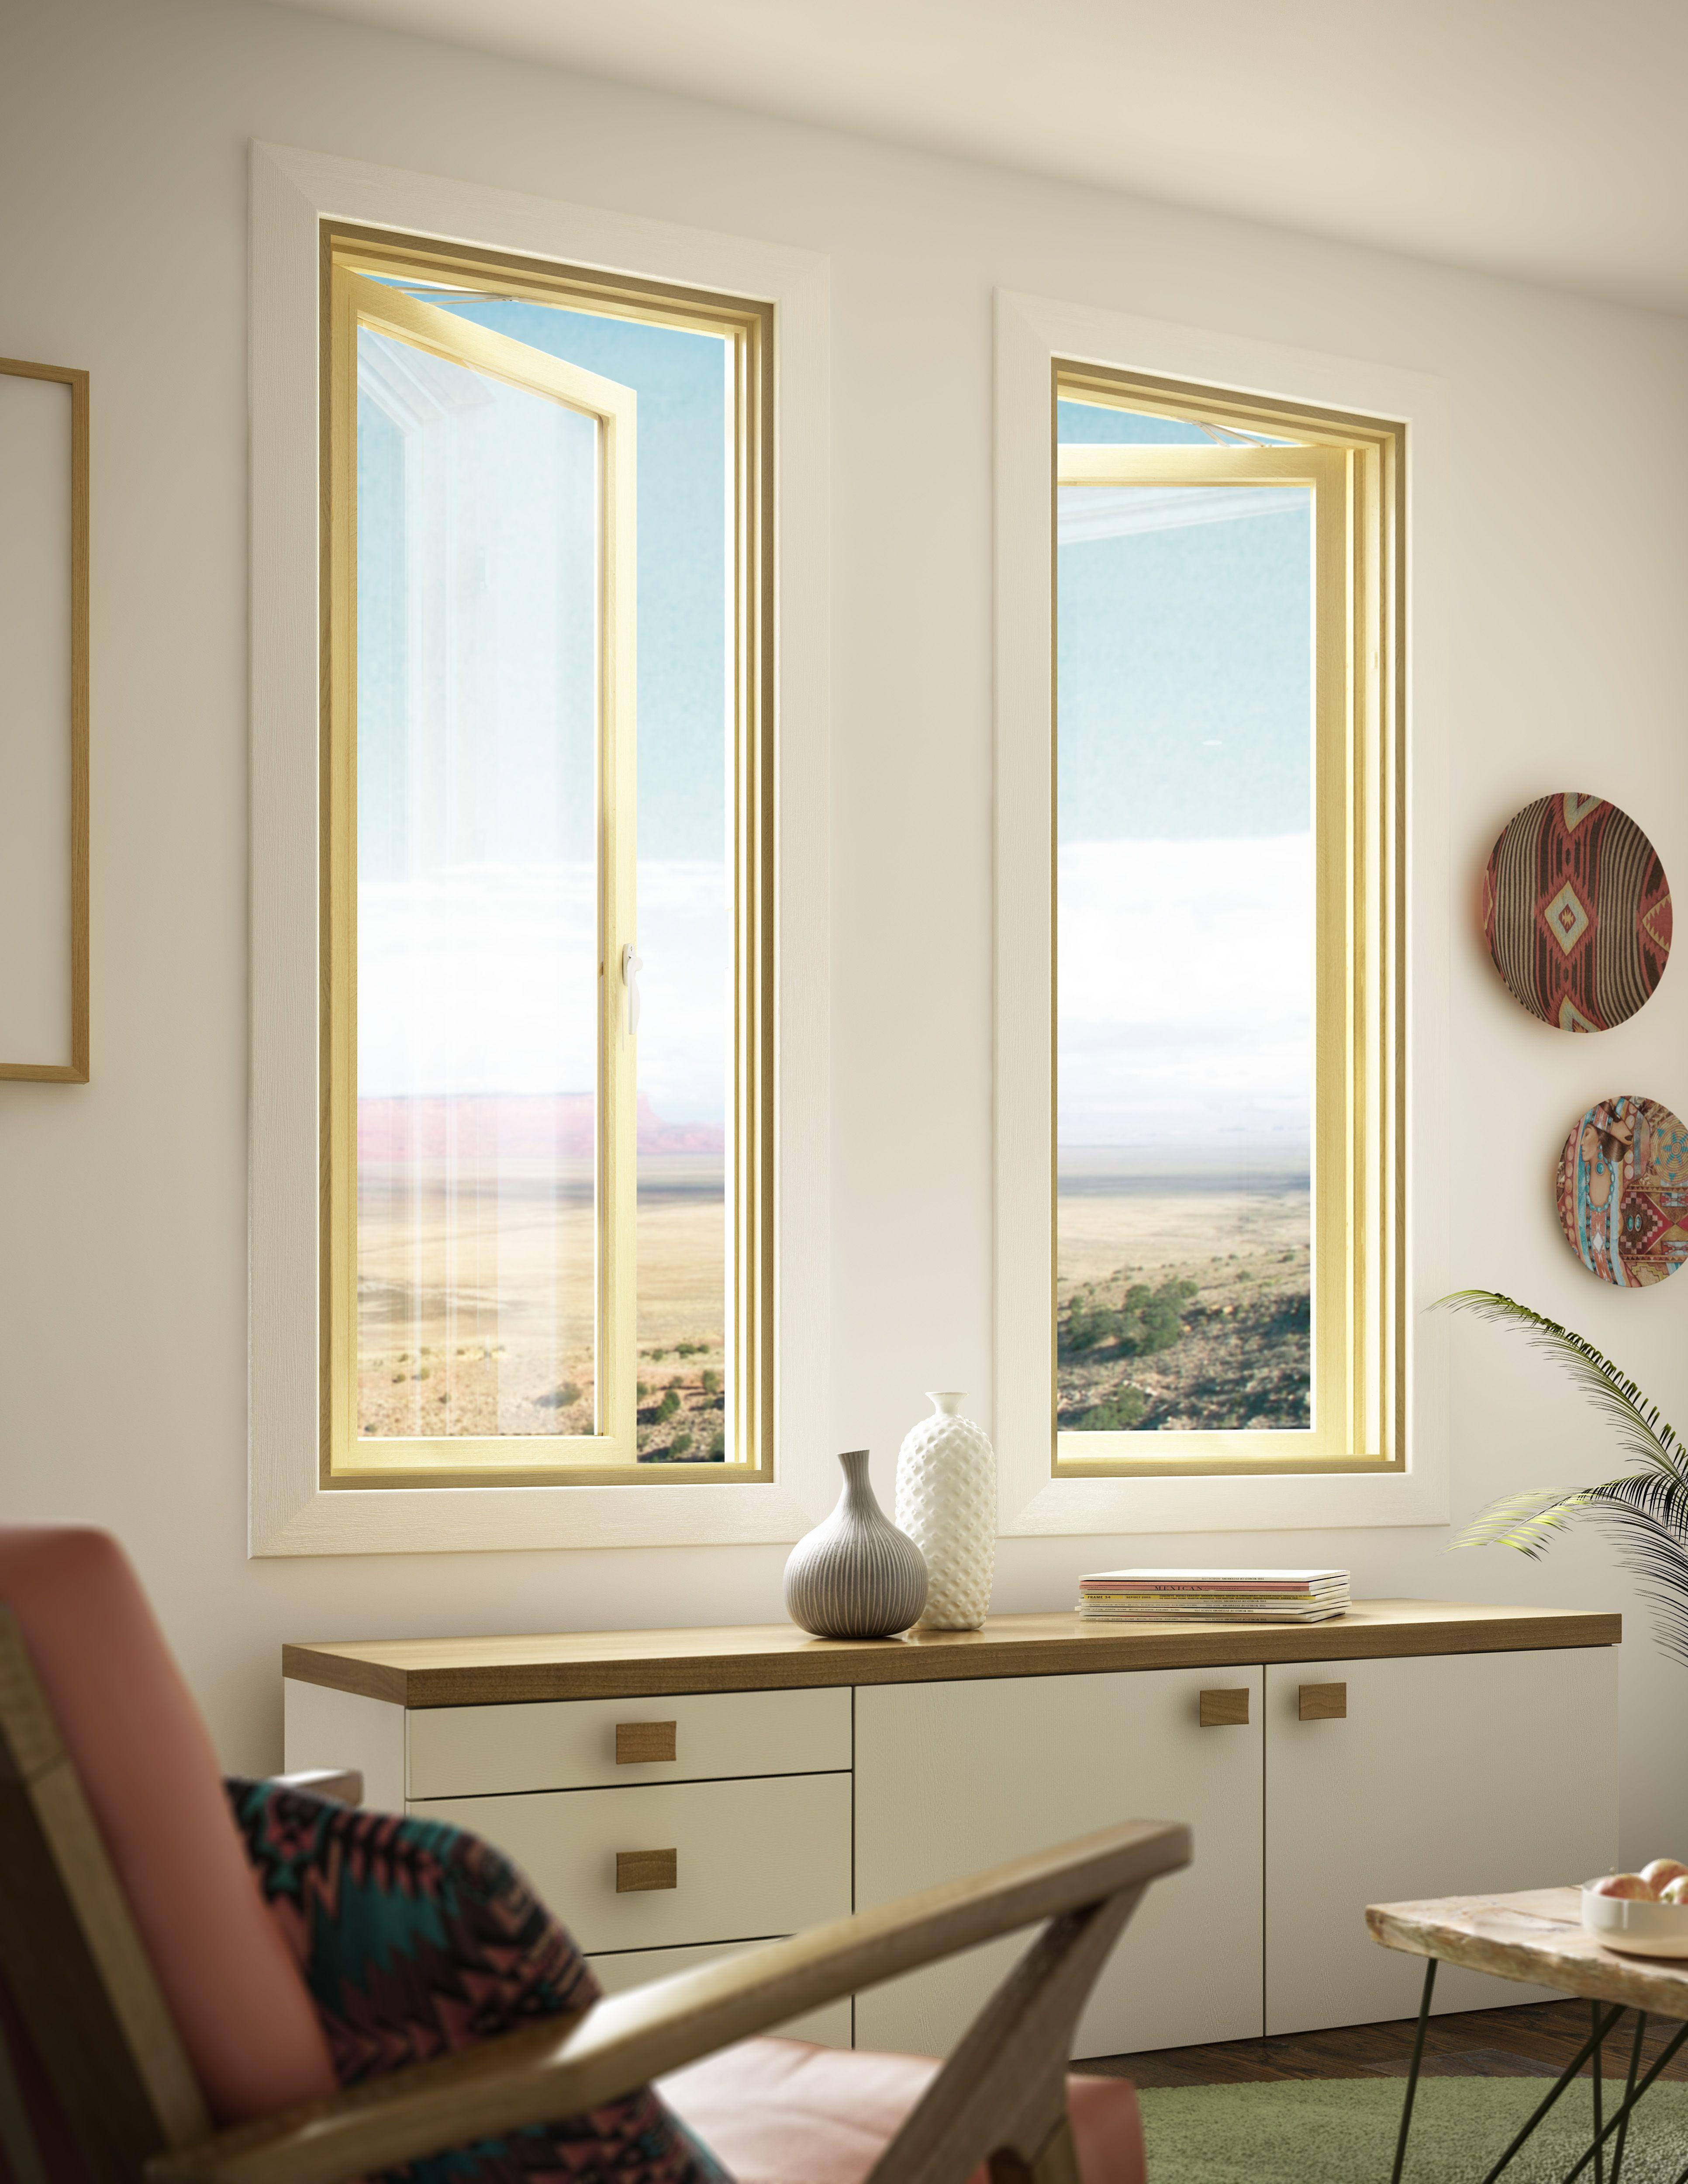 Jeld wen siteline push out casement window room by room for Buy jeld wen windows online